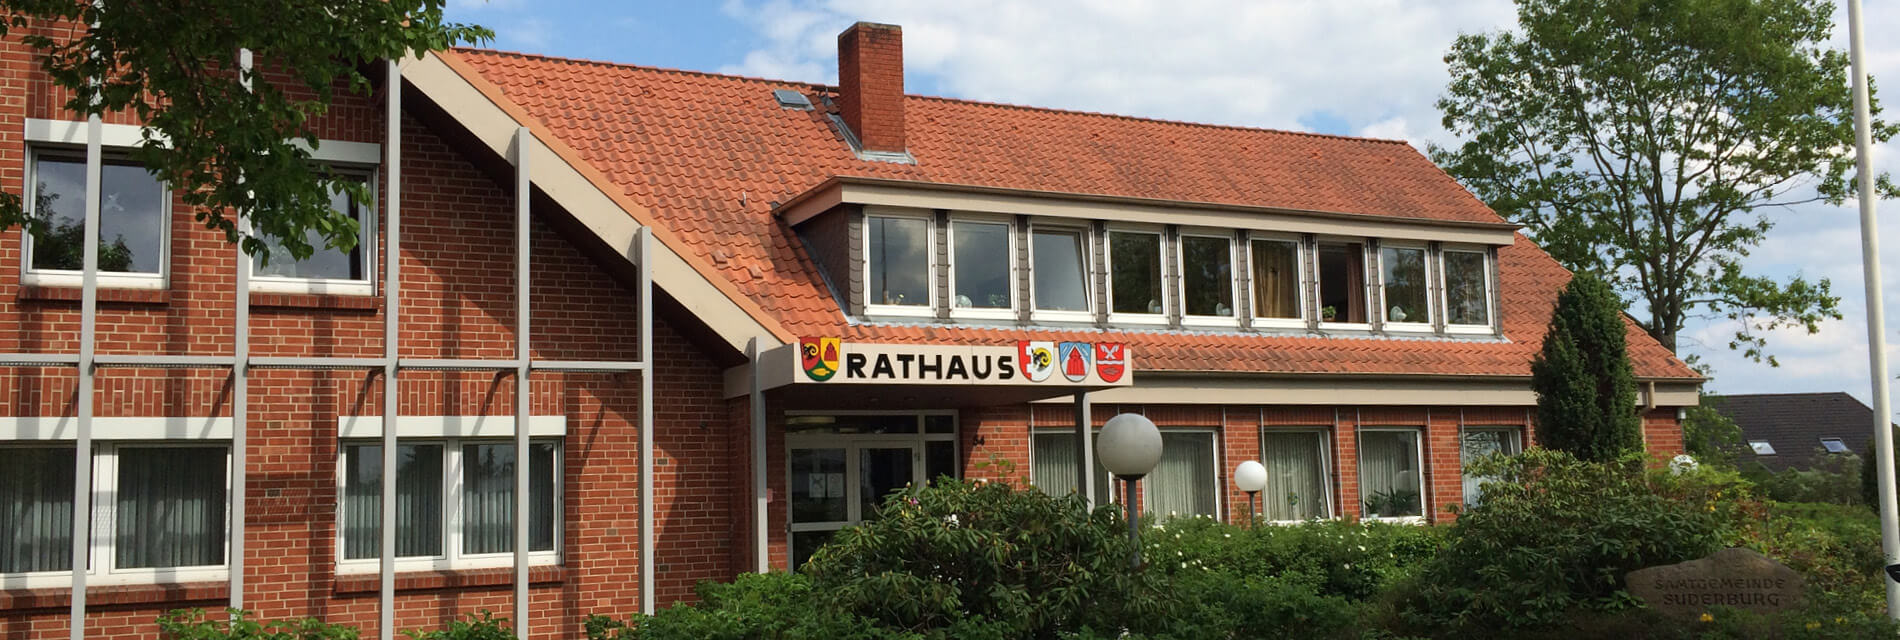 Rathaus Suderburg